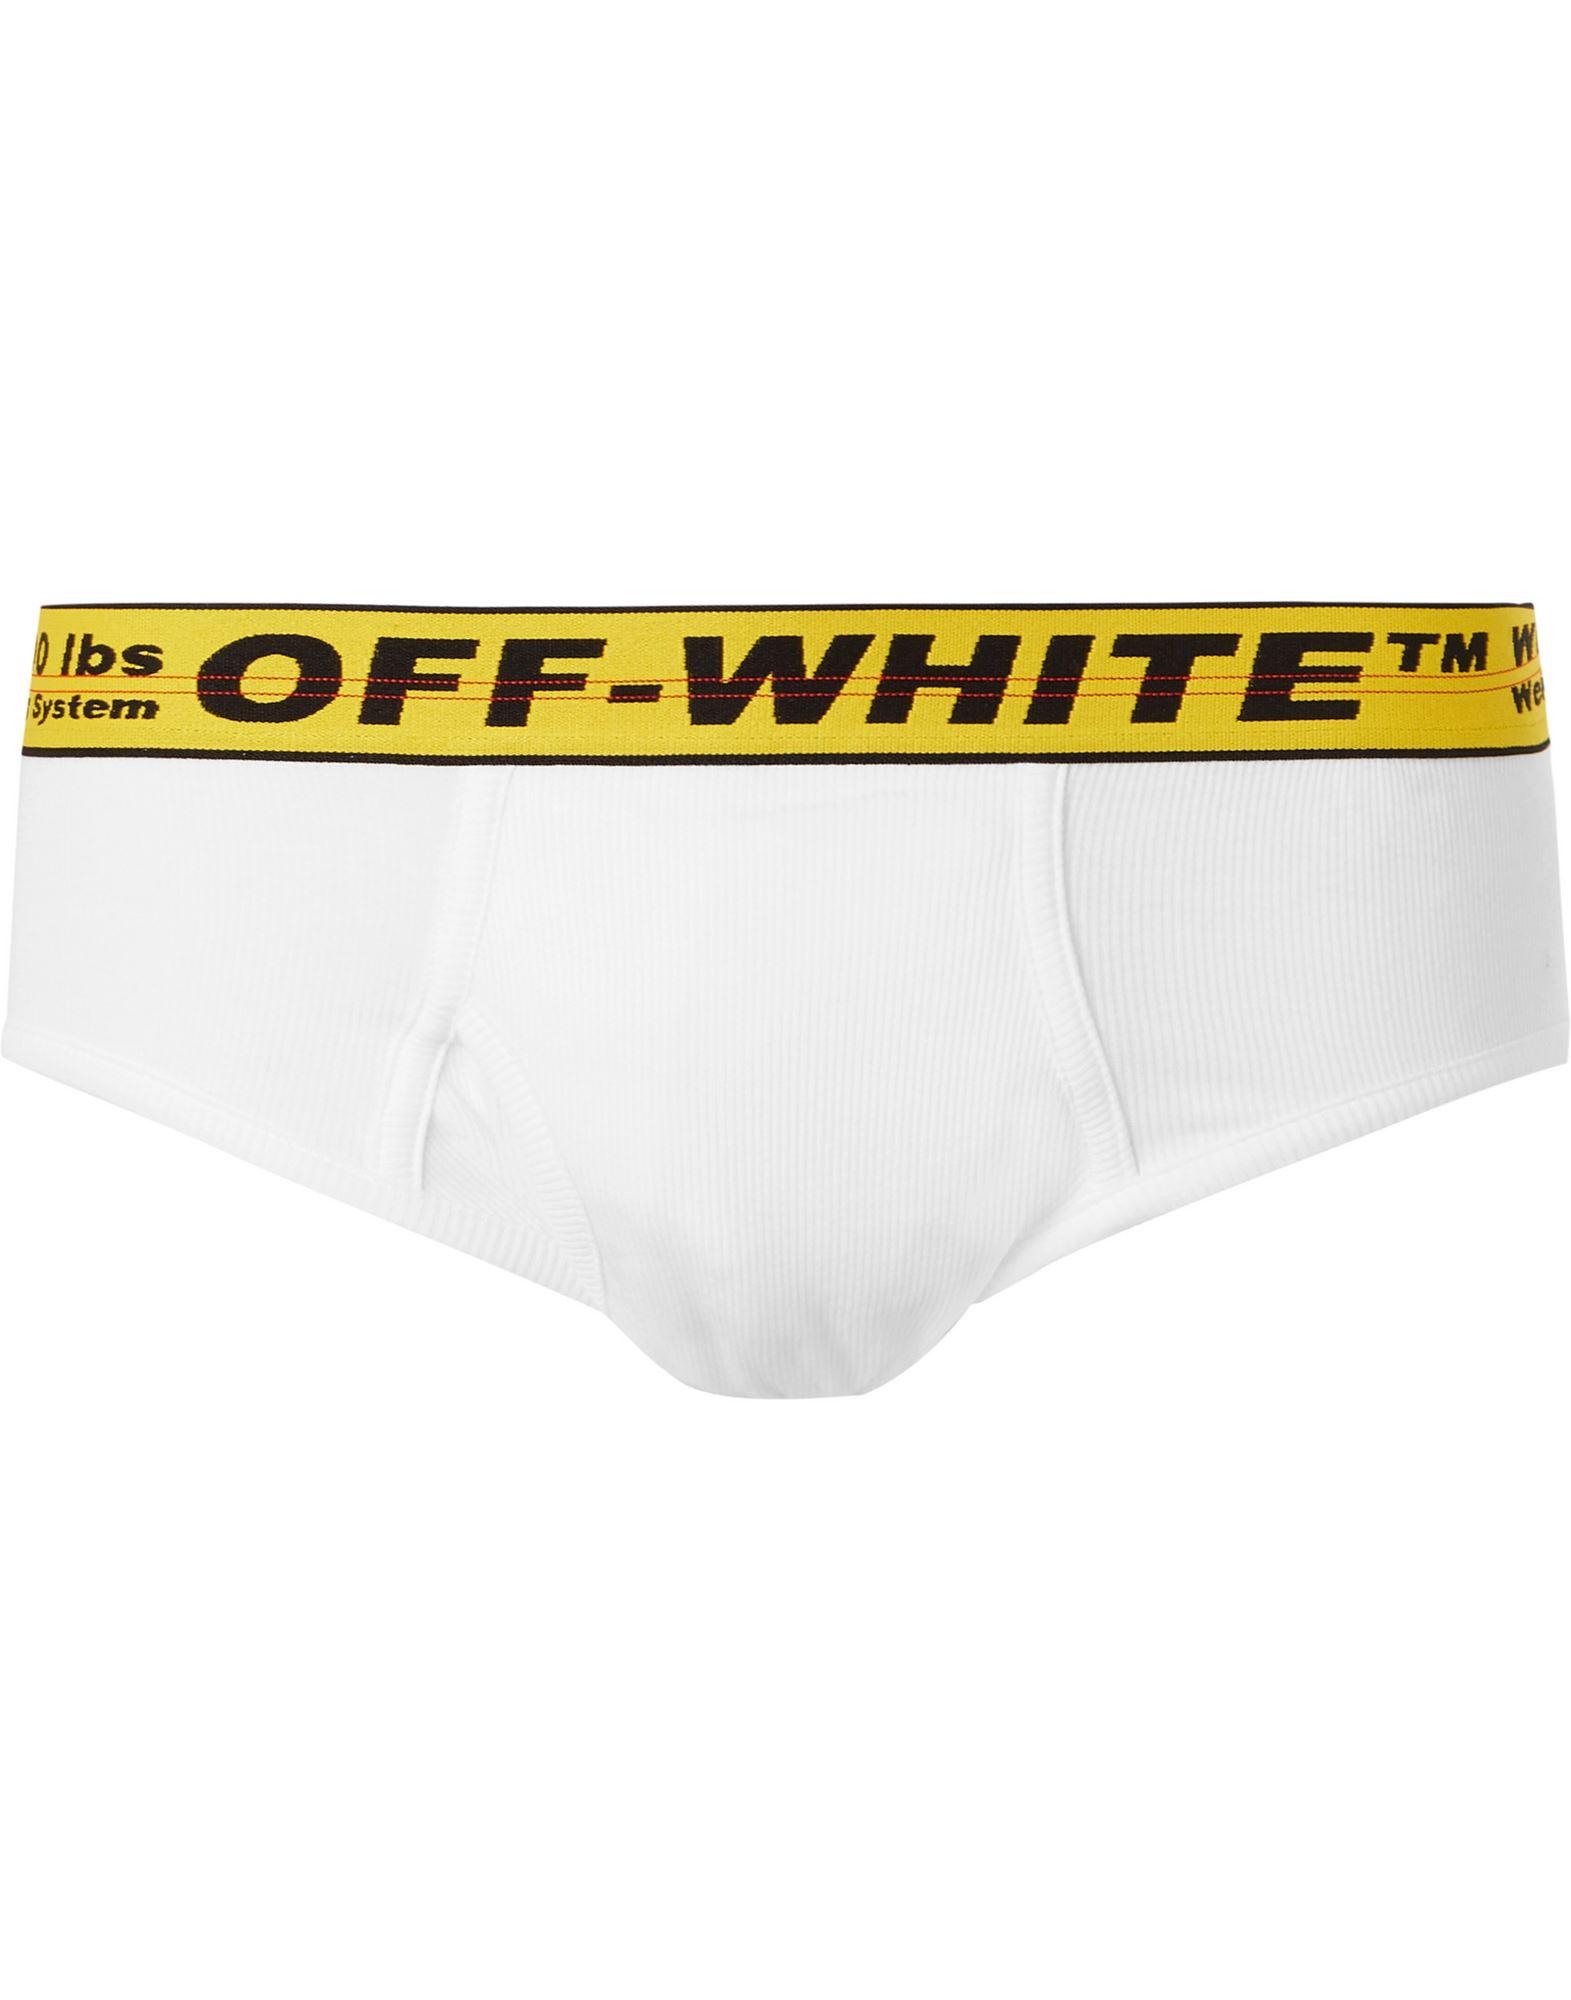 OFF-WHITE™ Трусы off white™ шарф